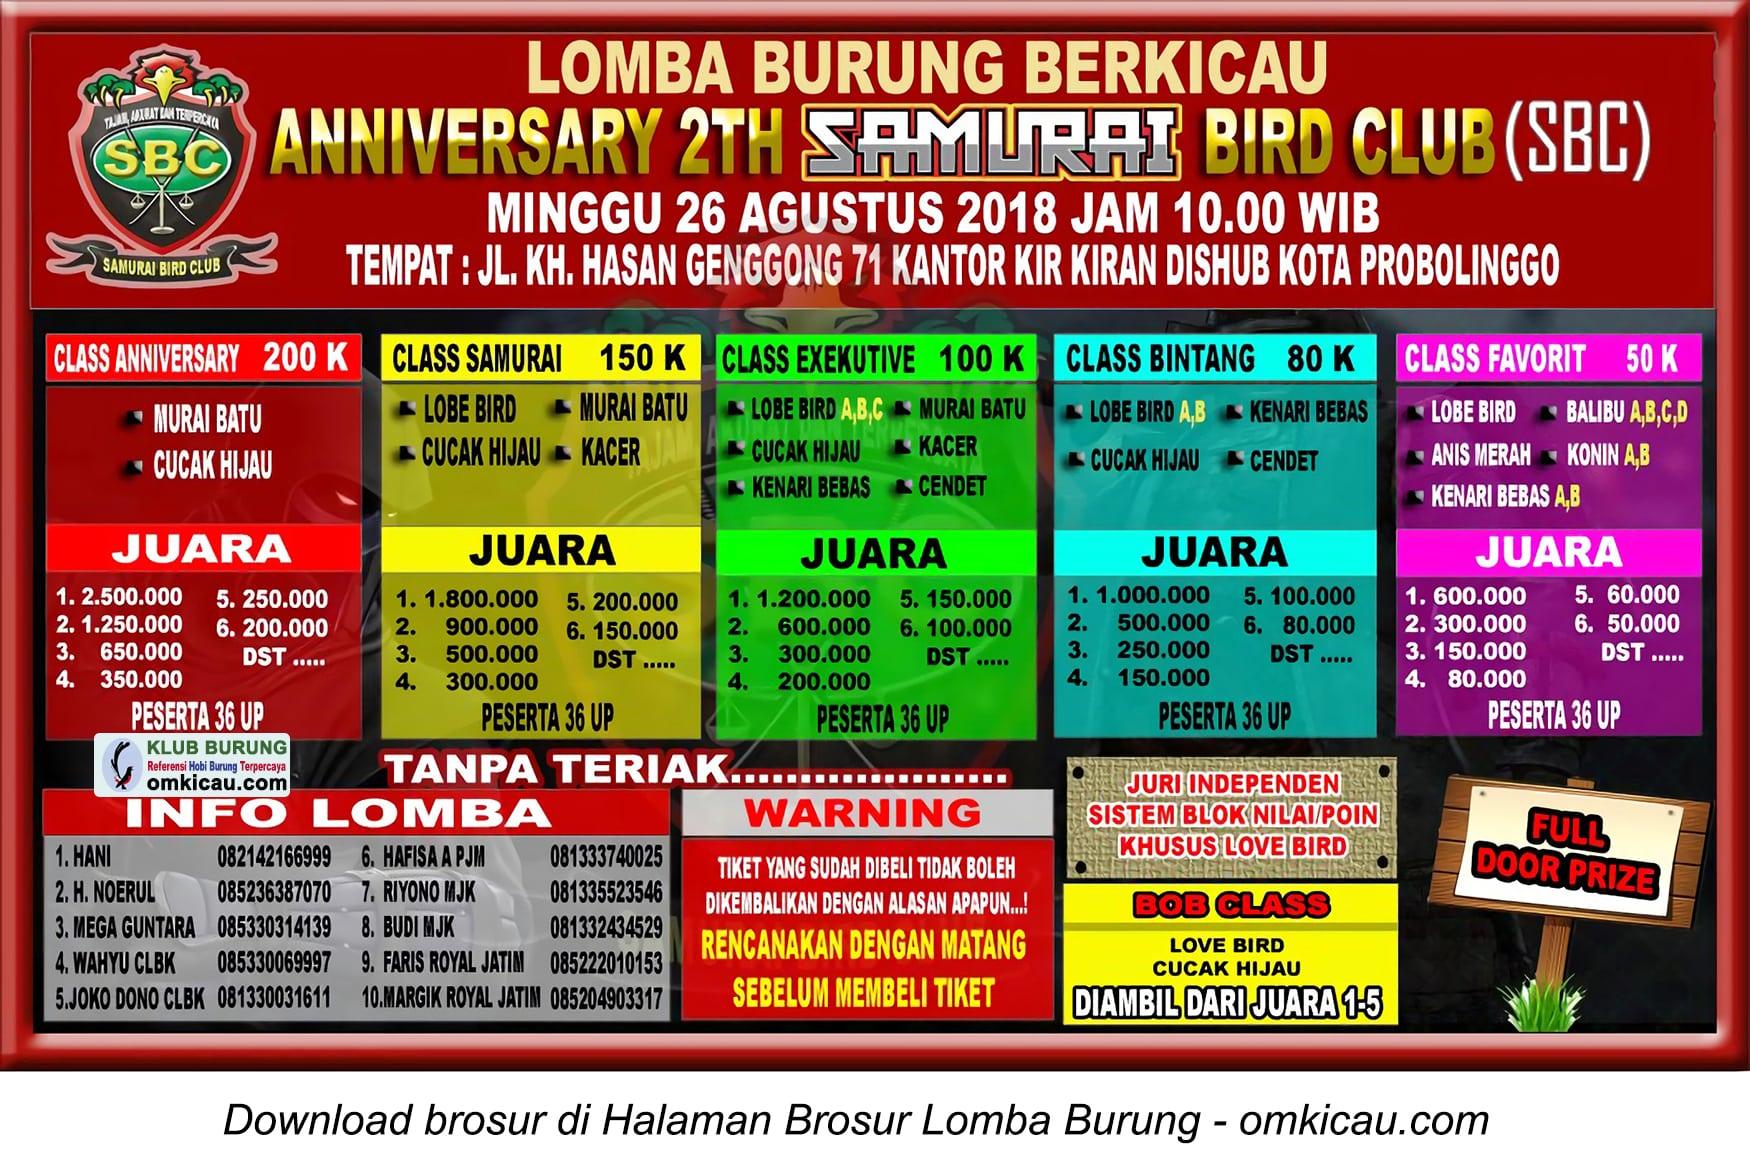 Anniversary 2Th Samurai Bird Club